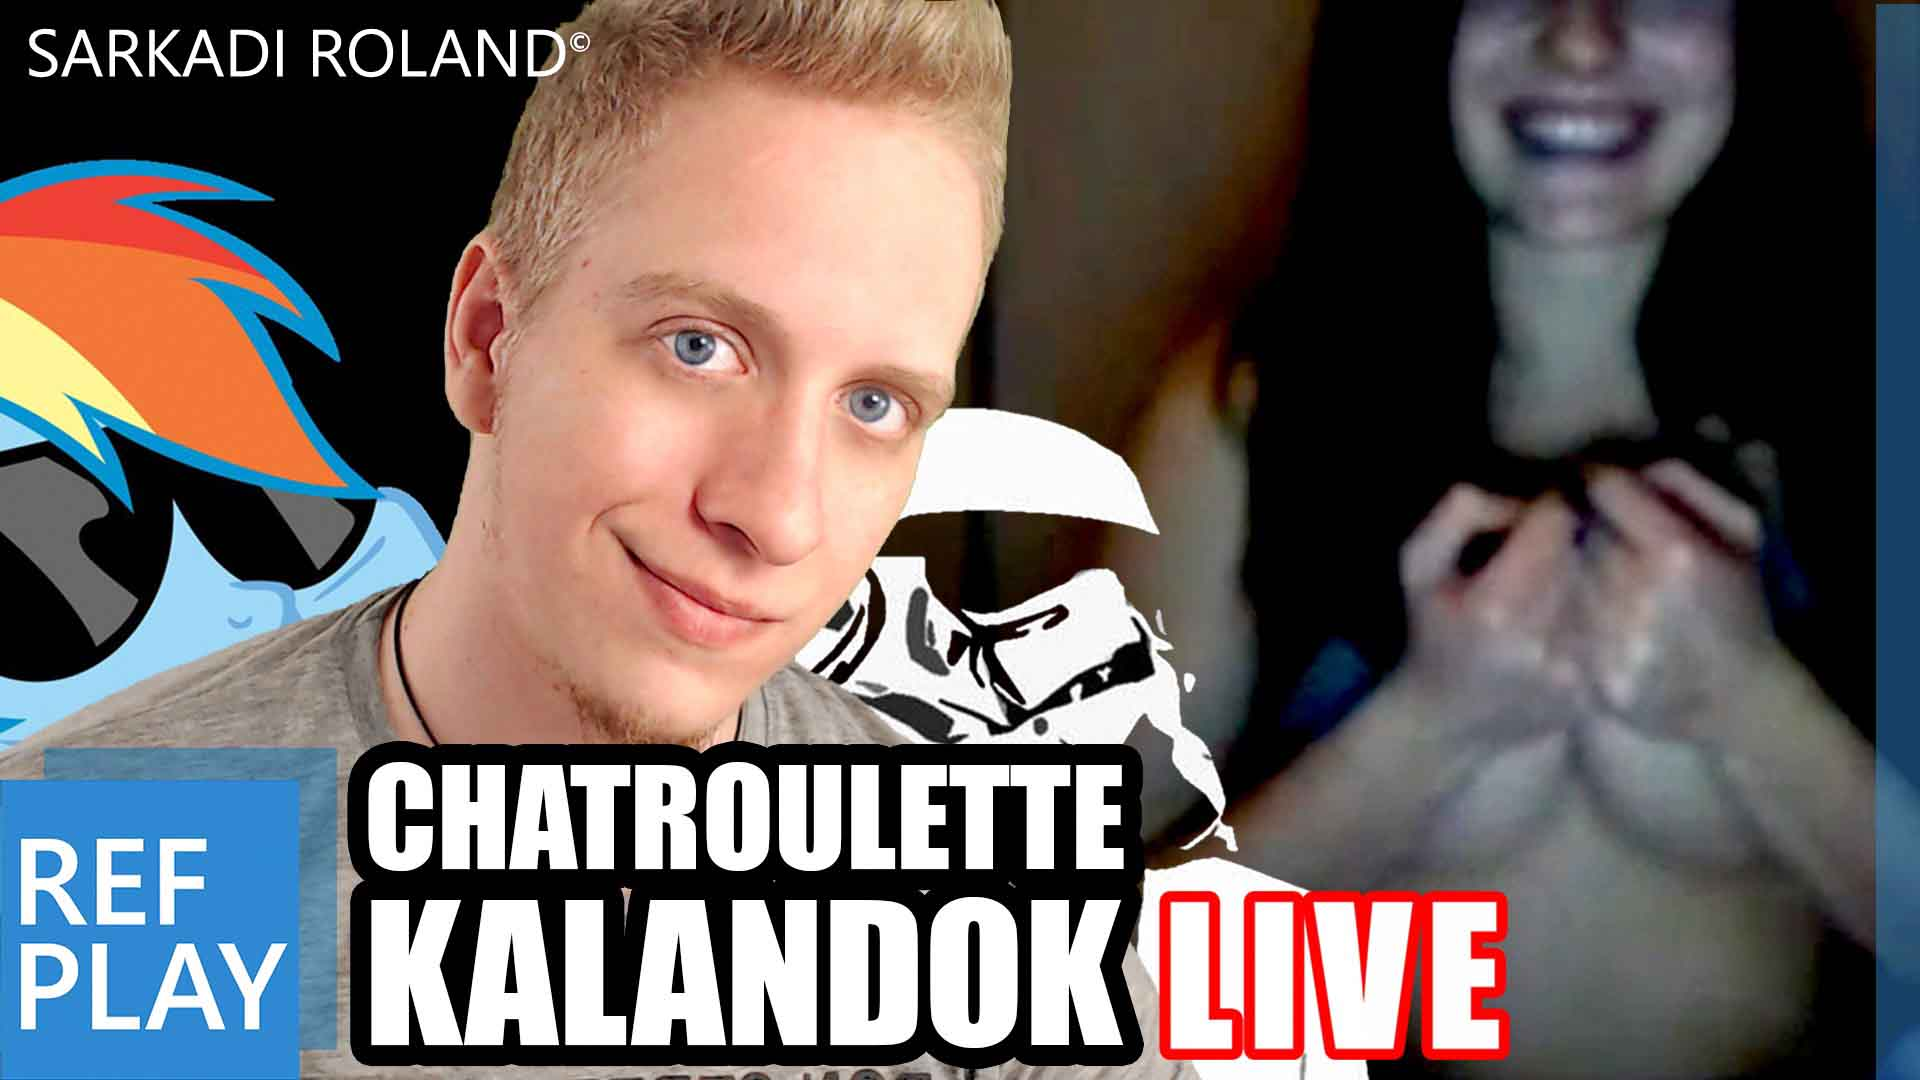 CHATROULETTE KALANDOK | REFPLAY